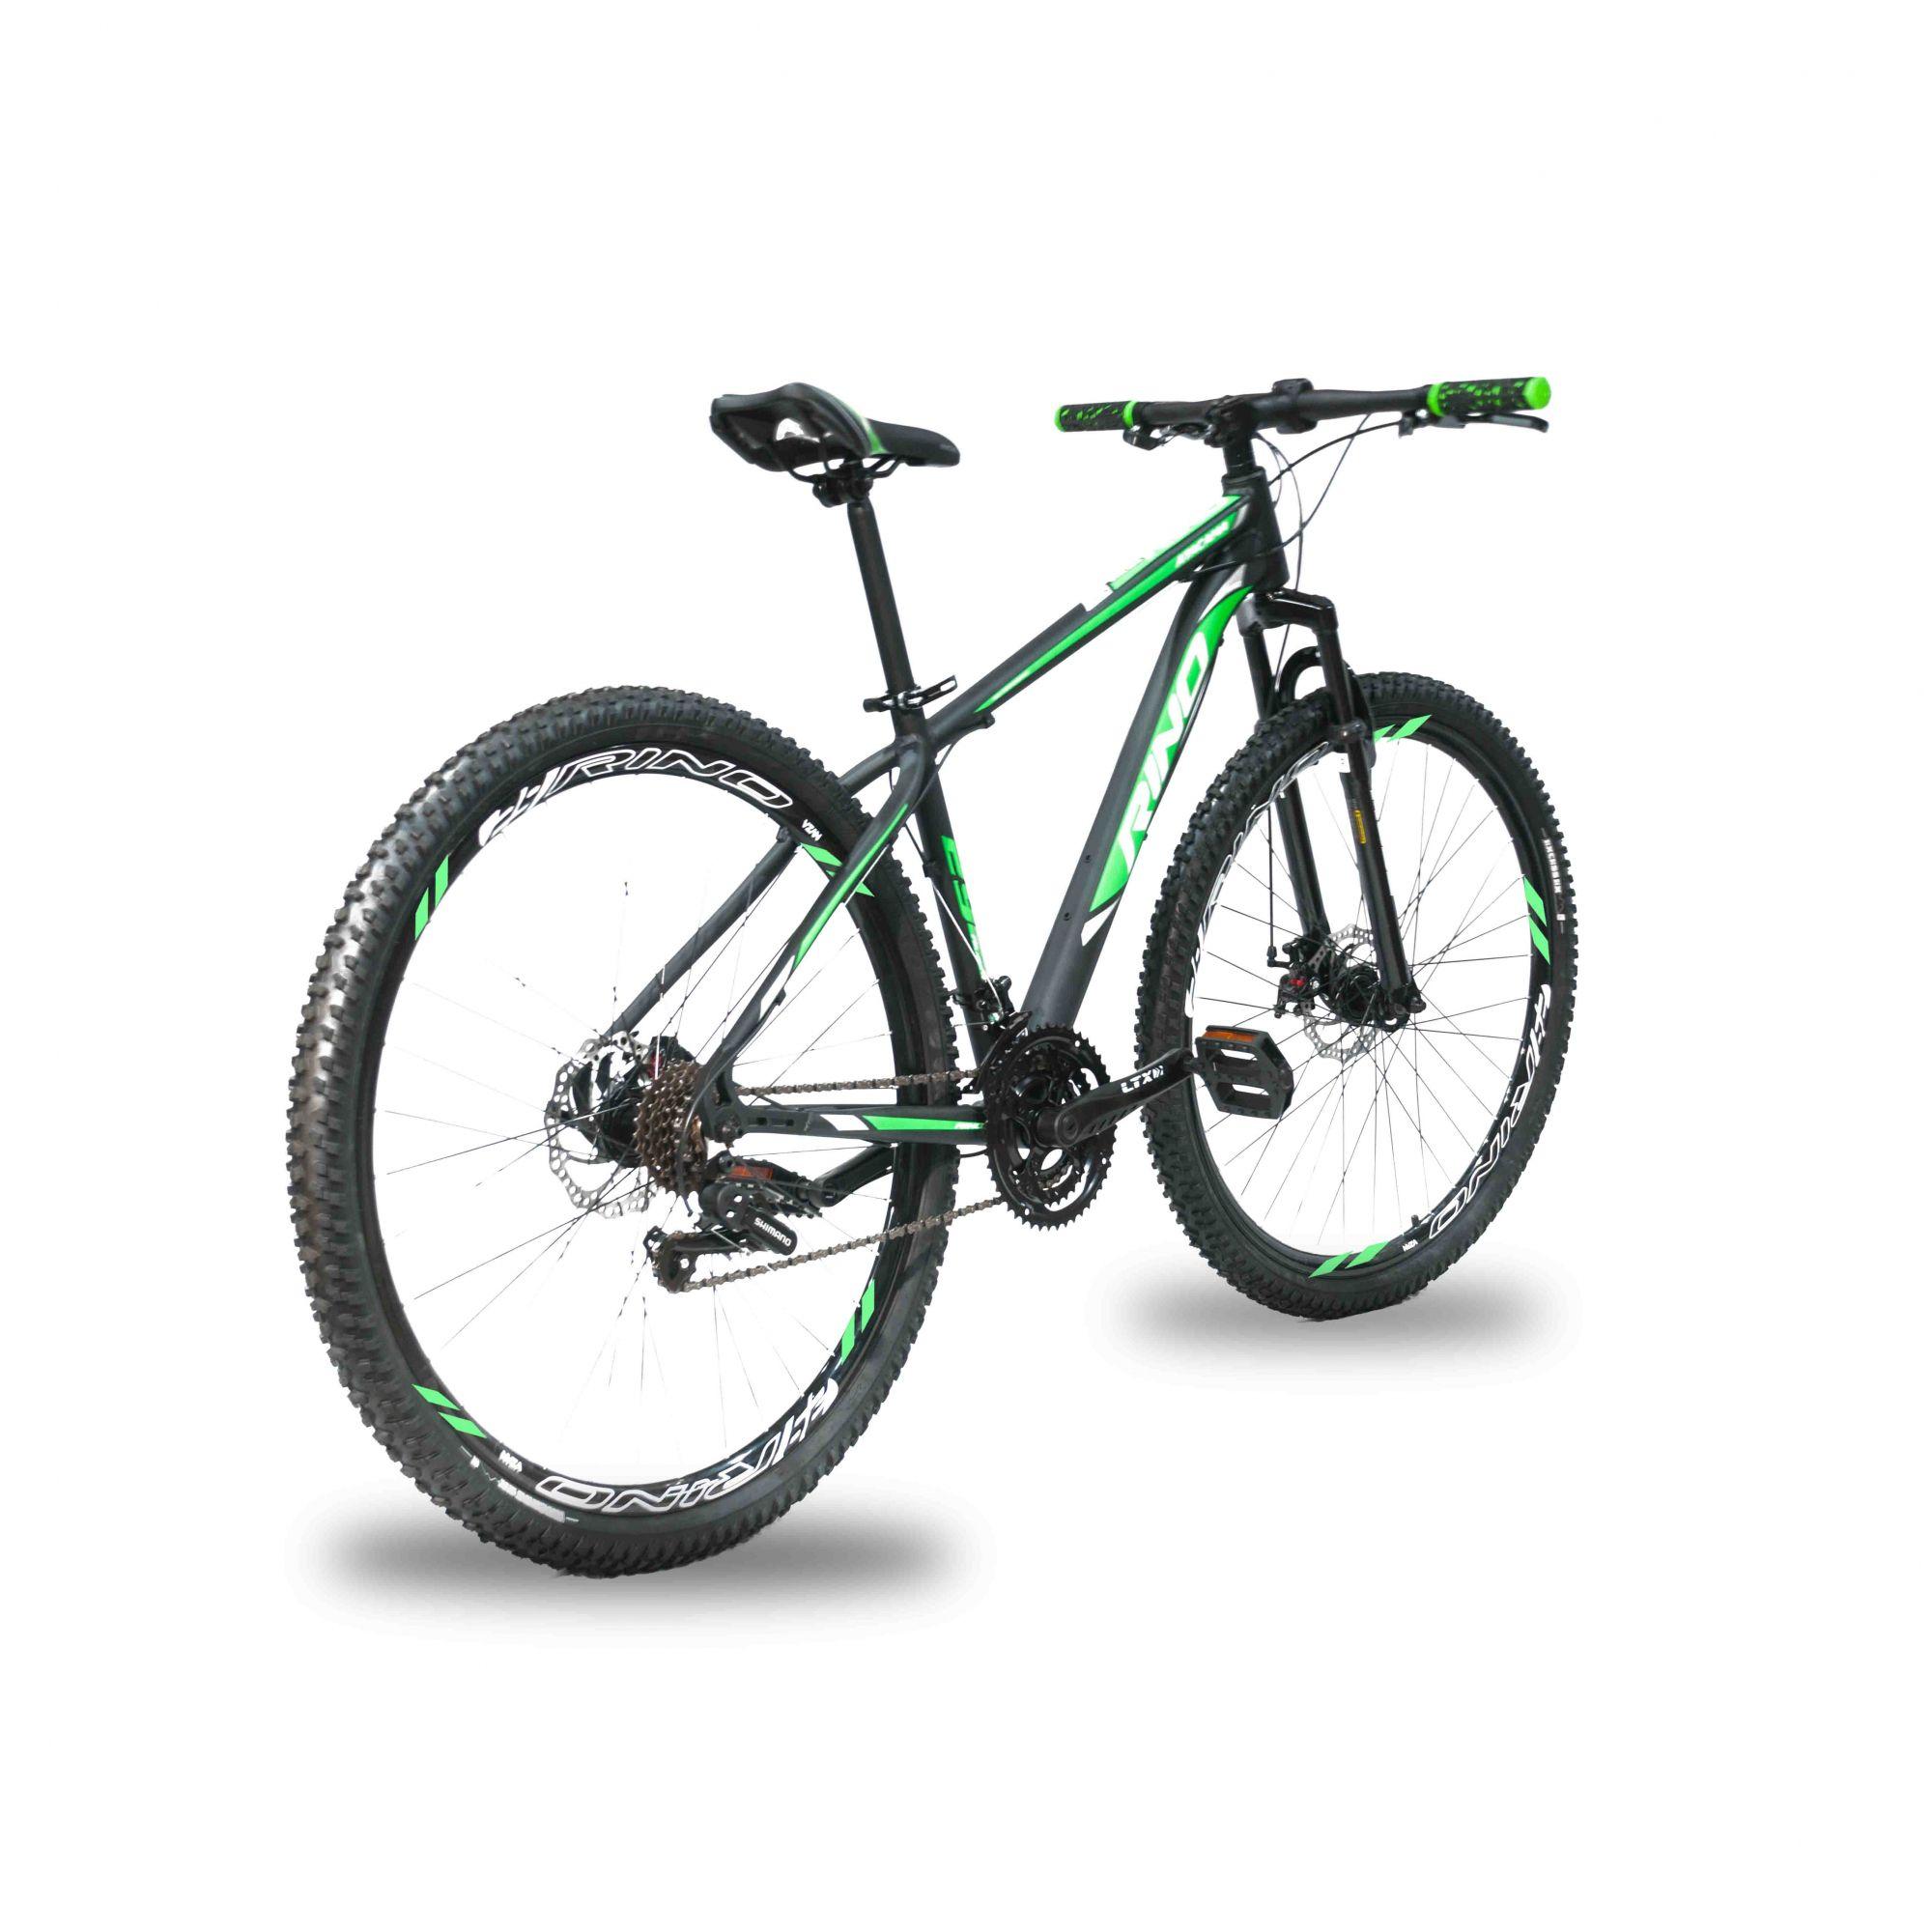 5dabb2a3f ... Bicicleta RINO câmbios Shimano COMPLETO aro 29 freio a disco 21 Marchas  2.0 - Extremebike ...